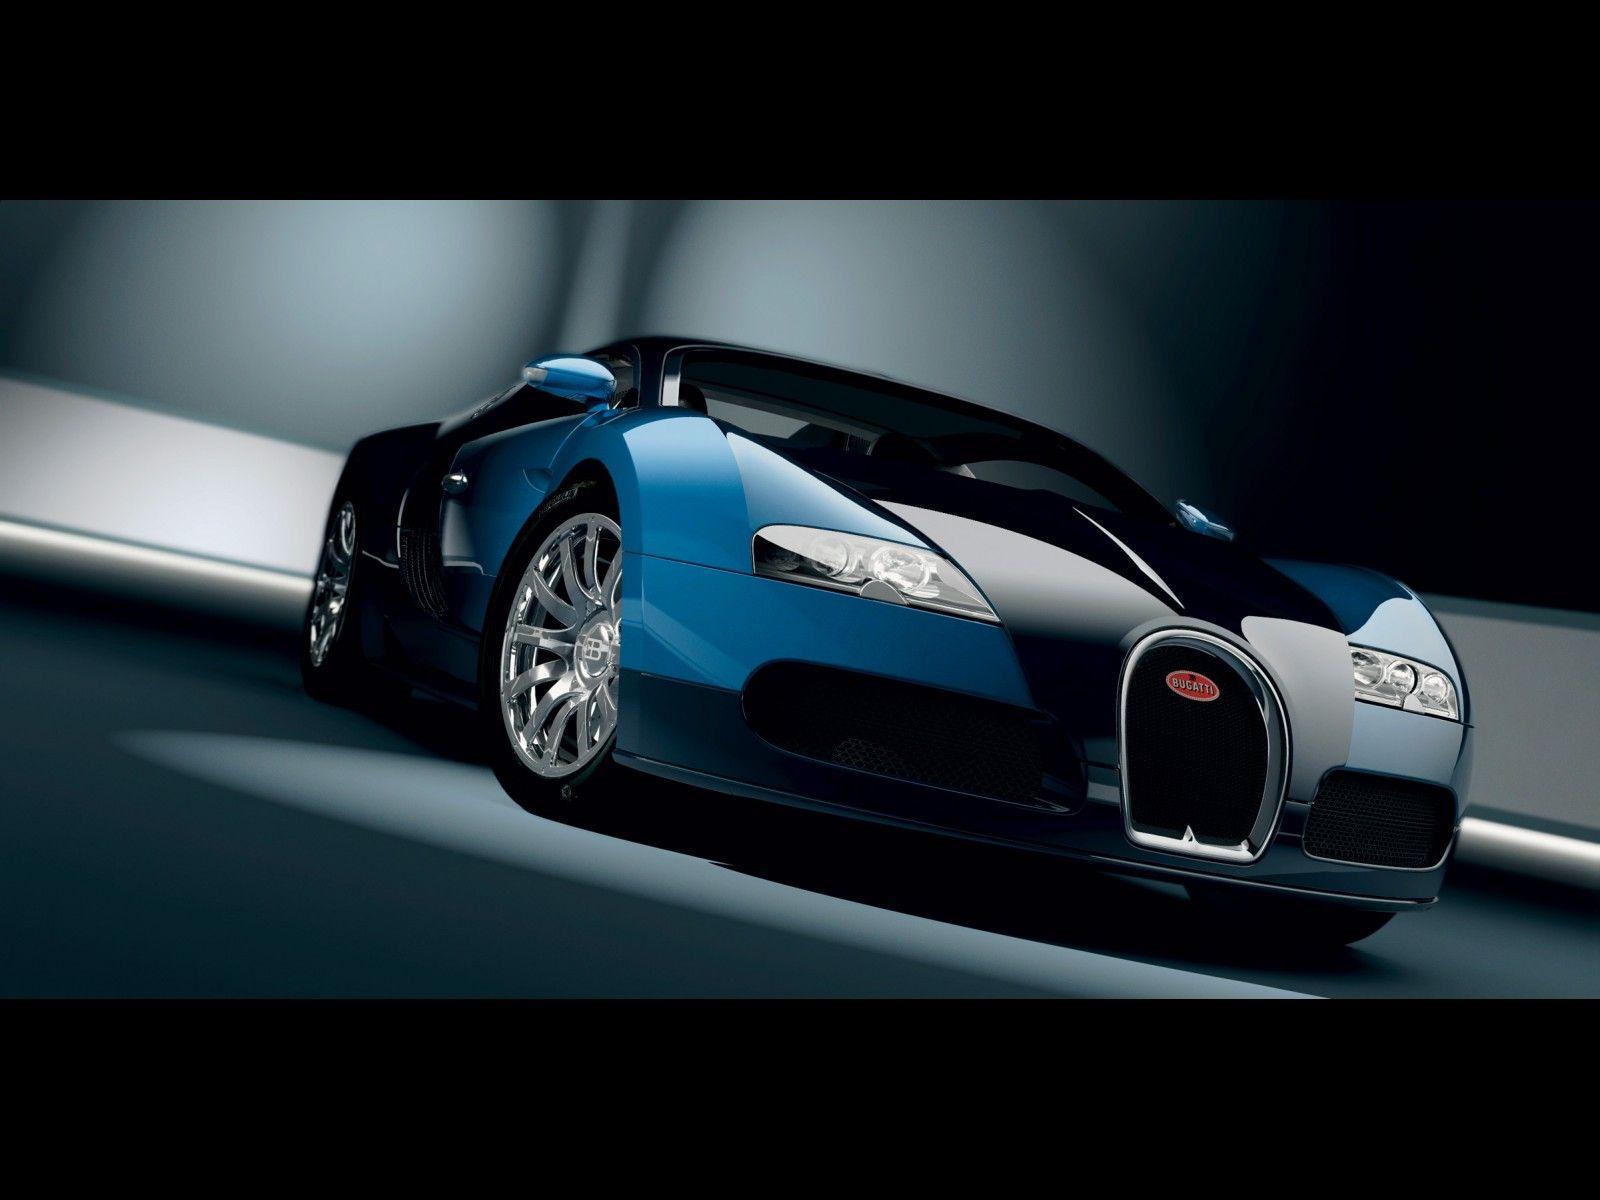 Bugatti Hd Wallpapers Top Free Bugatti Hd Backgrounds Wallpaperaccess